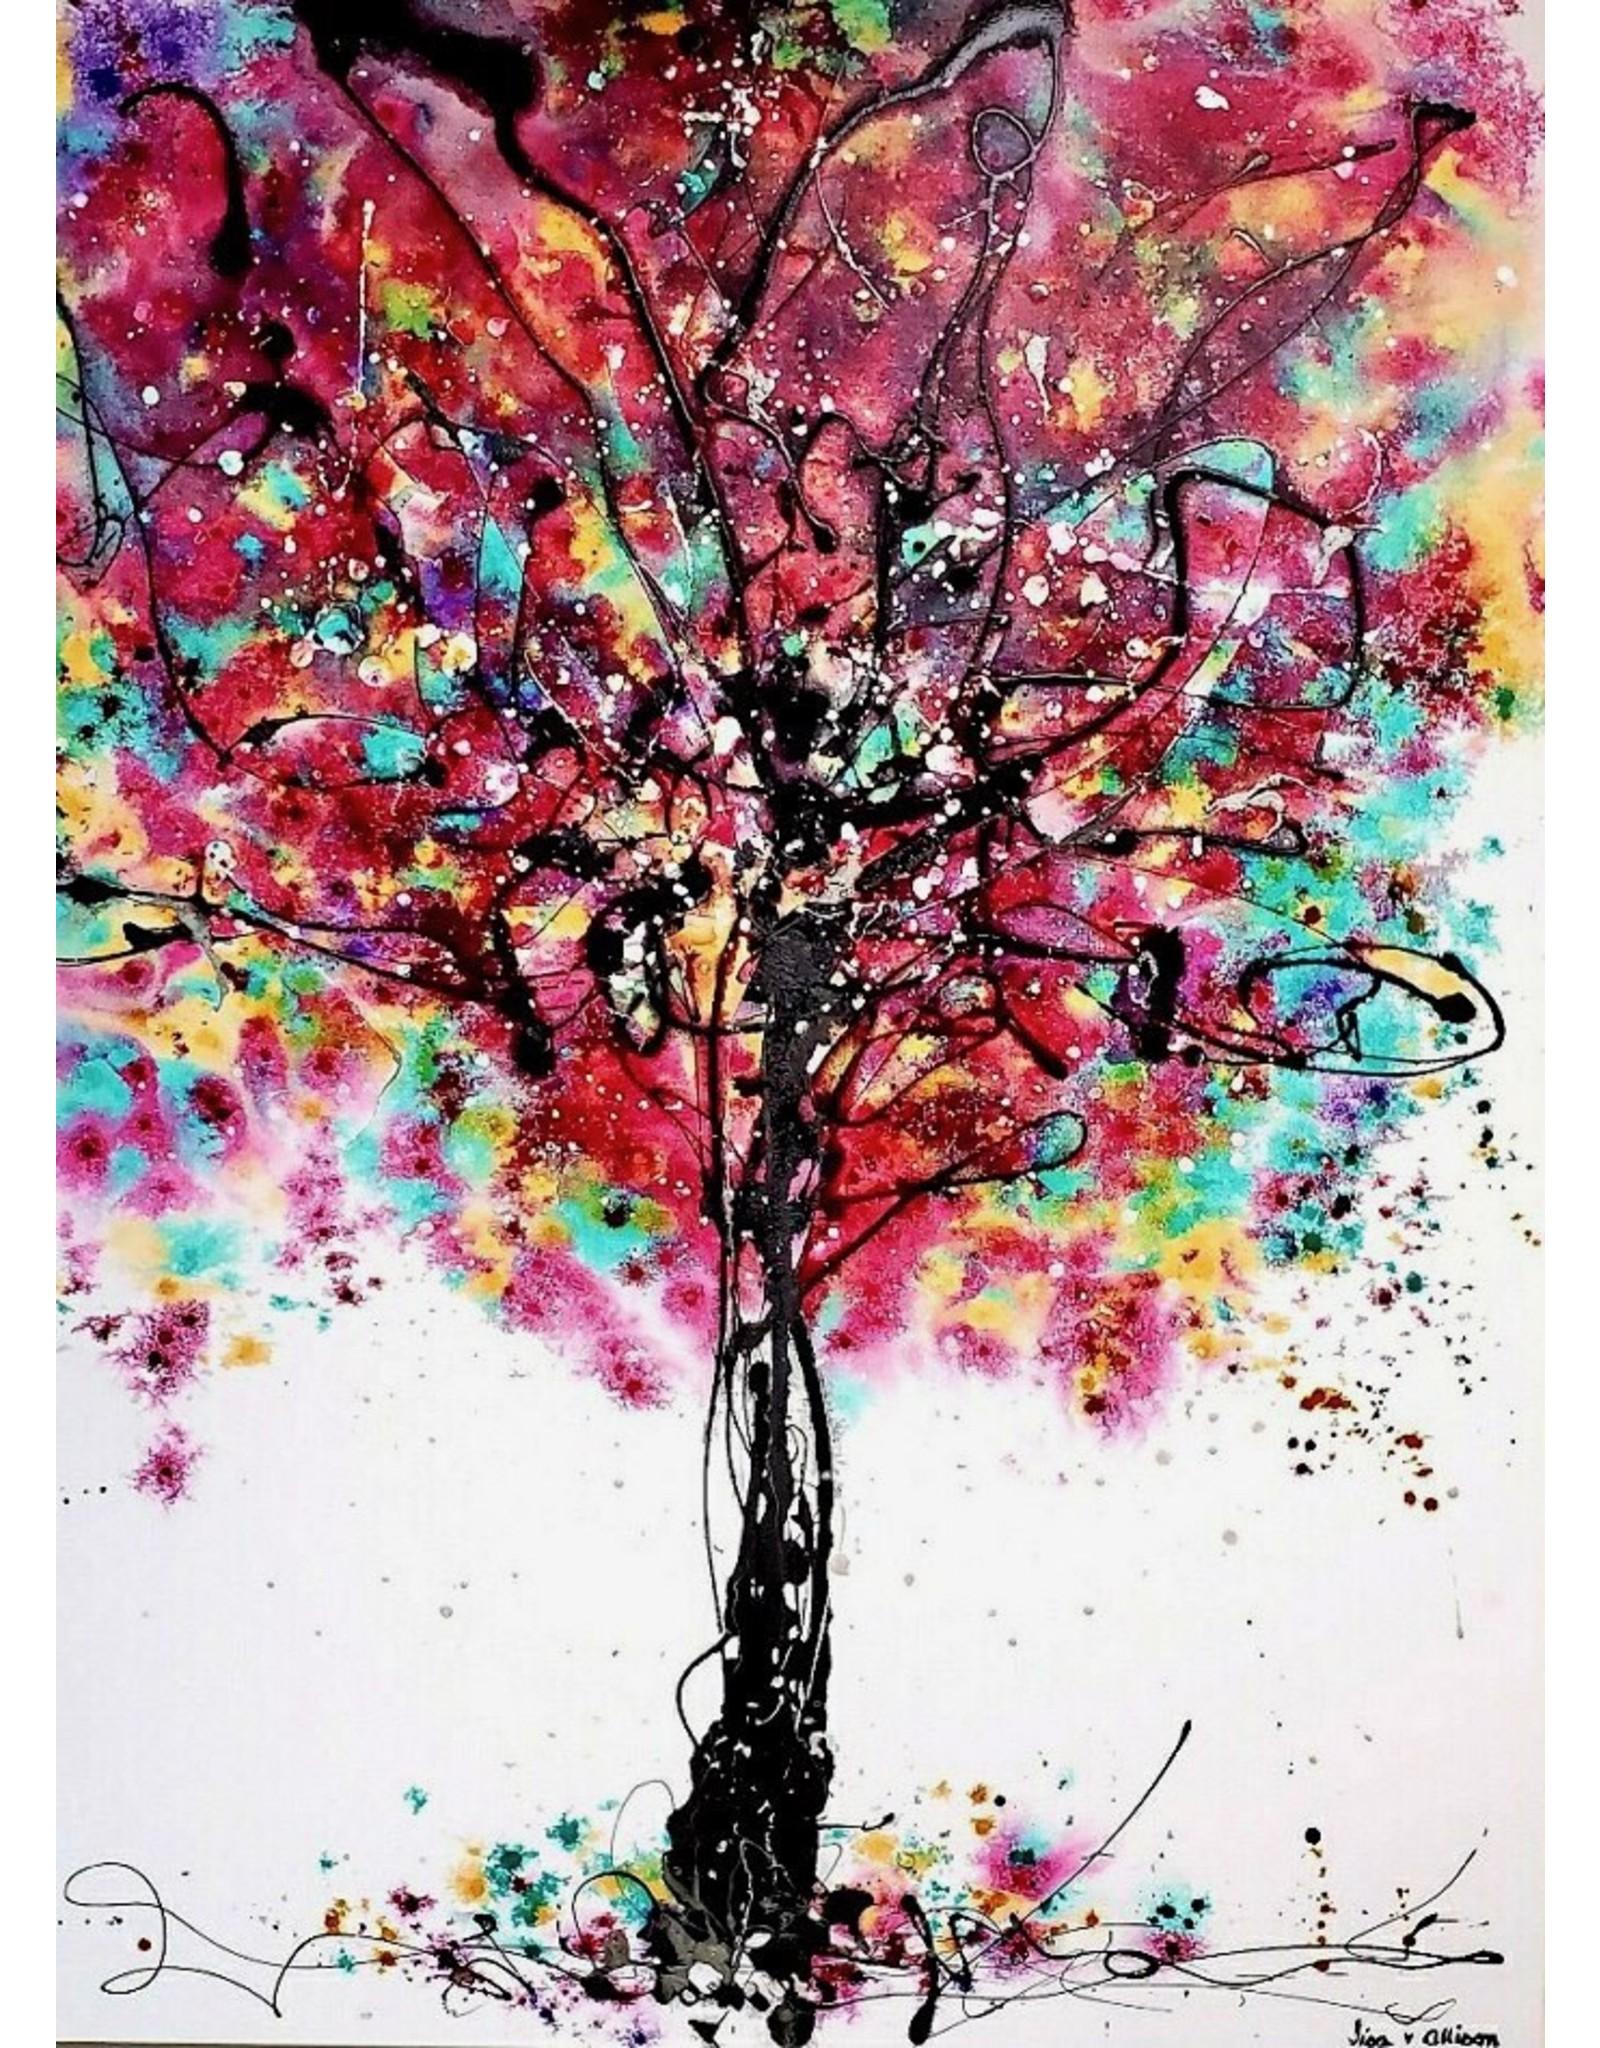 "Lisa Jill Allison LOVE'S IN FASHION, acrylic on GW canvas, 60x48"", LISA"